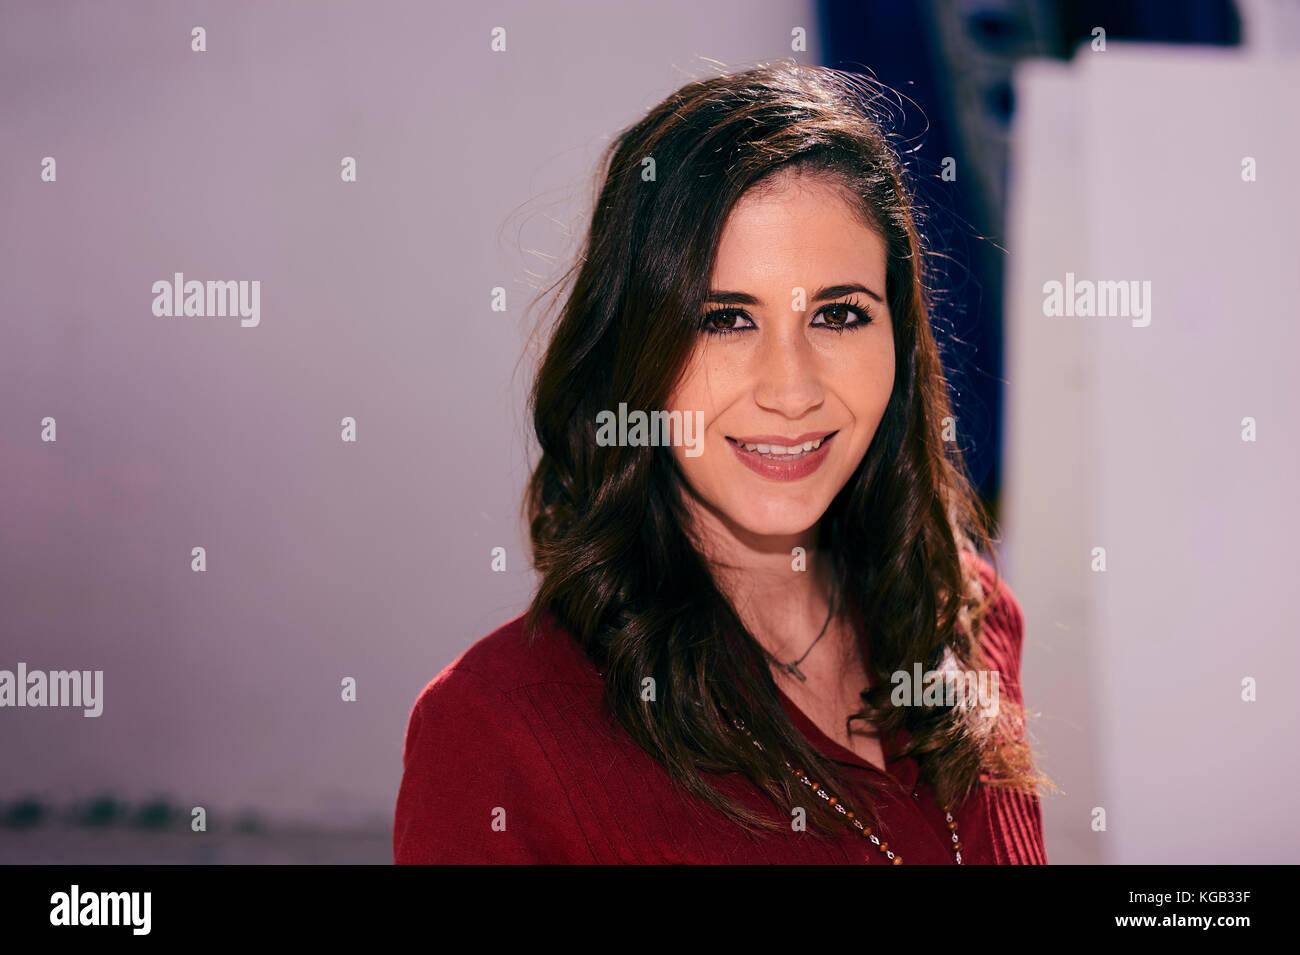 Jeune woman smiling Photo Stock